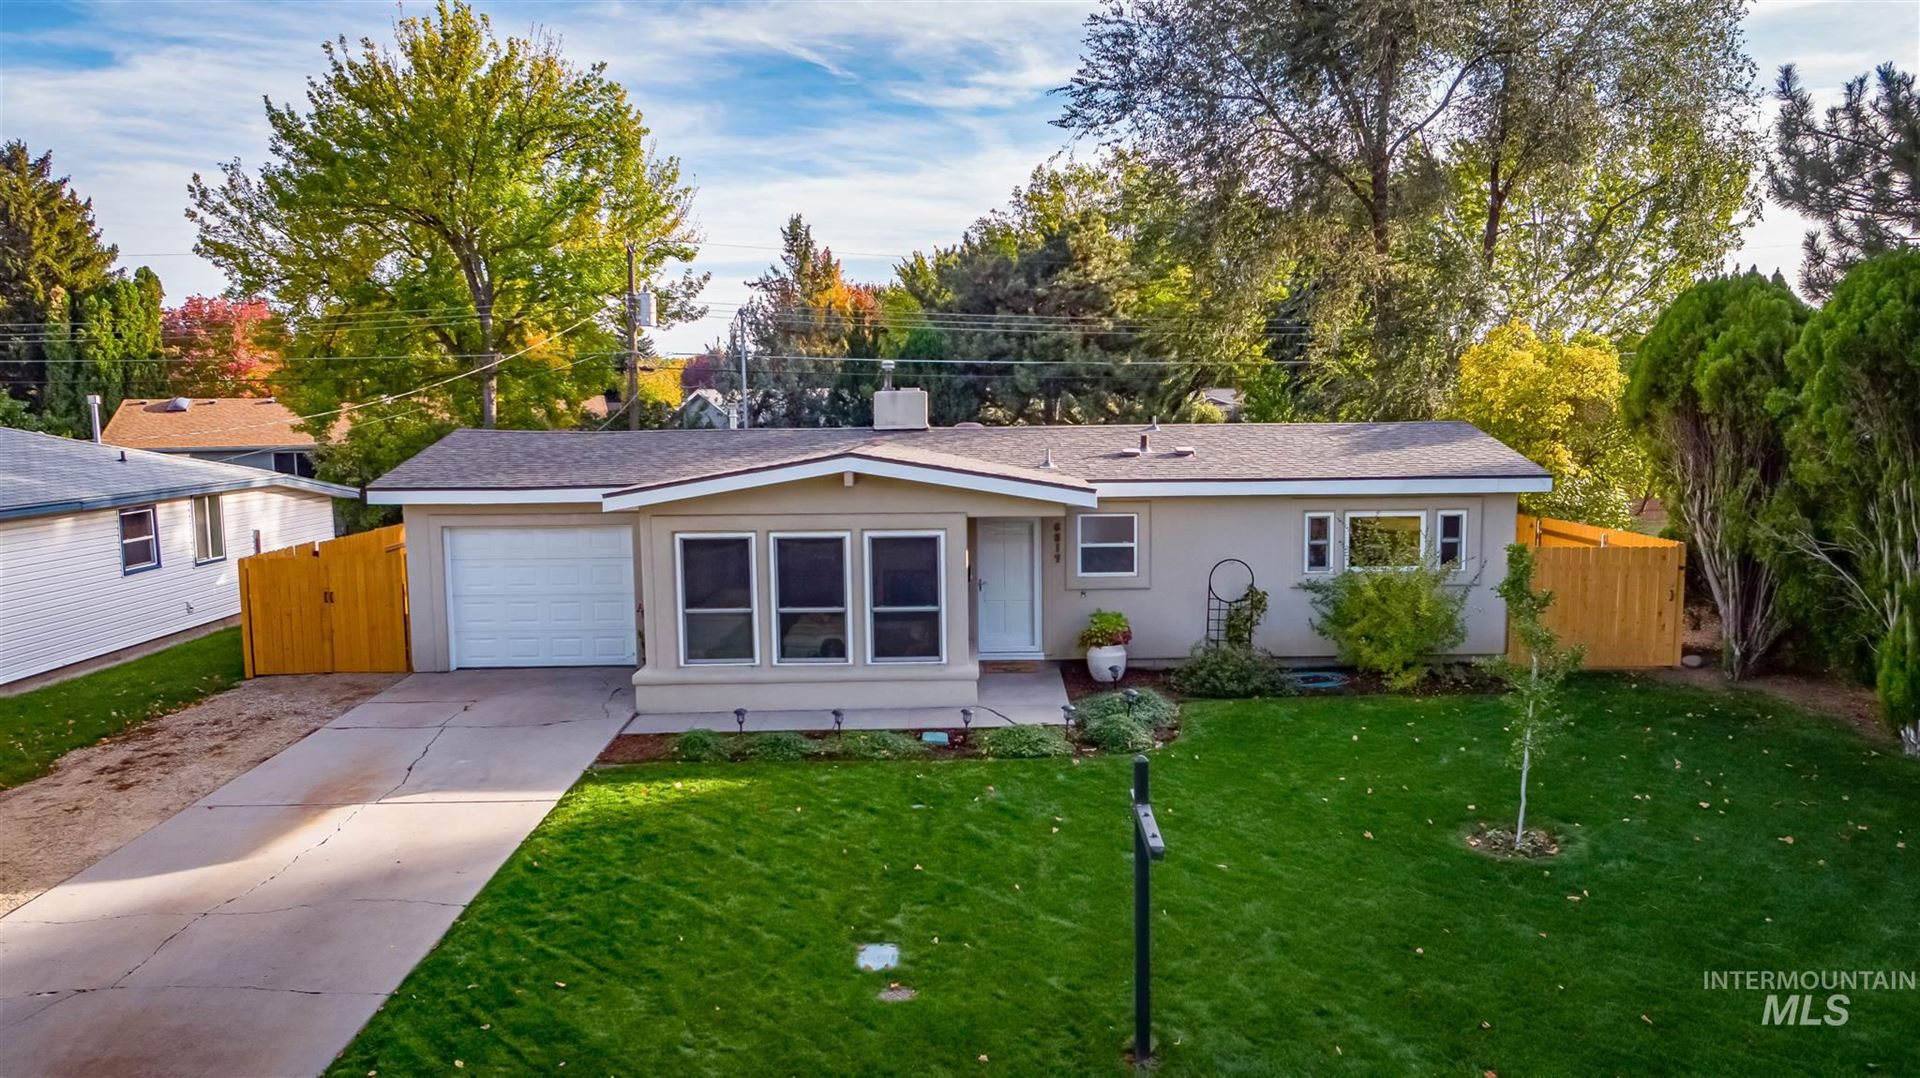 6817 W Folk Drive, Boise, ID 83704 - MLS#: 98784364